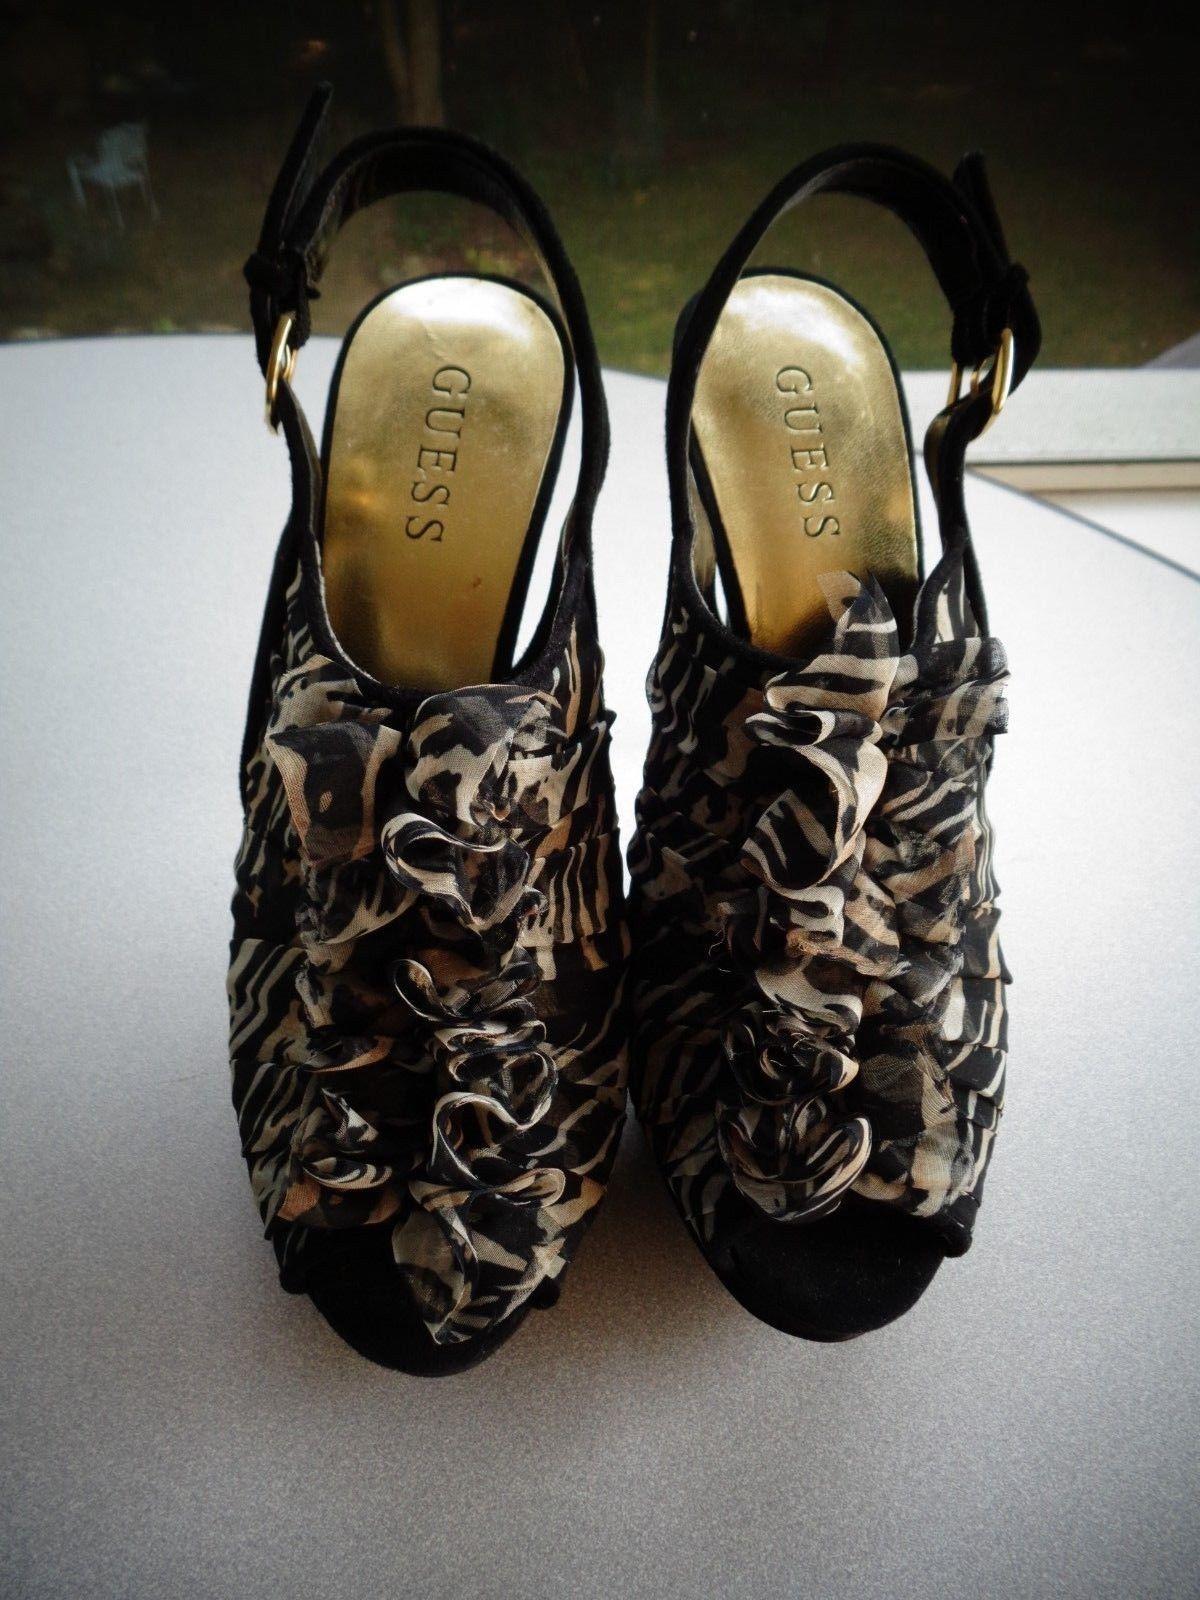 6c4c9ba4d3ae0 GUESS Kailua ~ Platform Sling-Back Heels Pumps Peep-Toe ~ Shoes Size 6.5